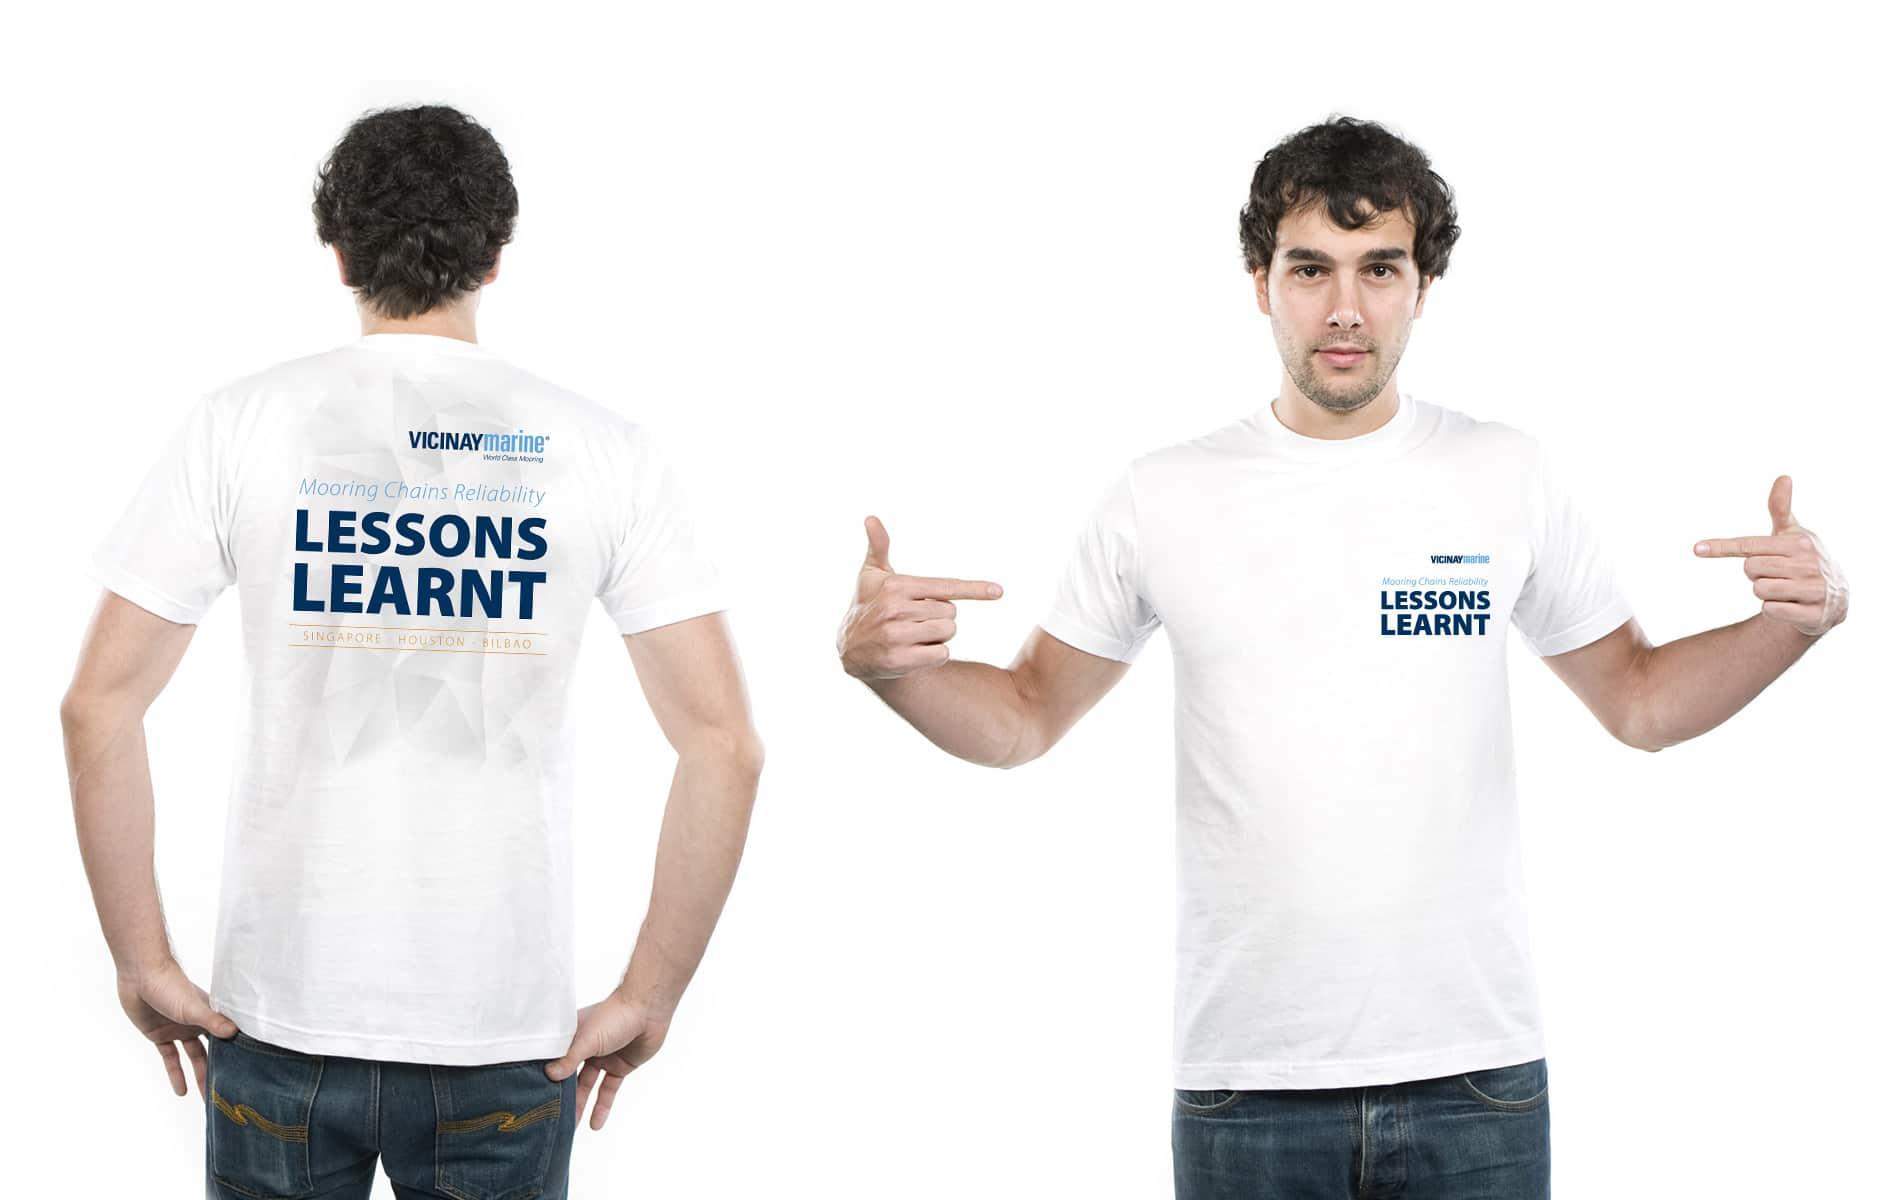 Sirope-Proyectos-Vicinay-Seminarios Vicinay-camiseta